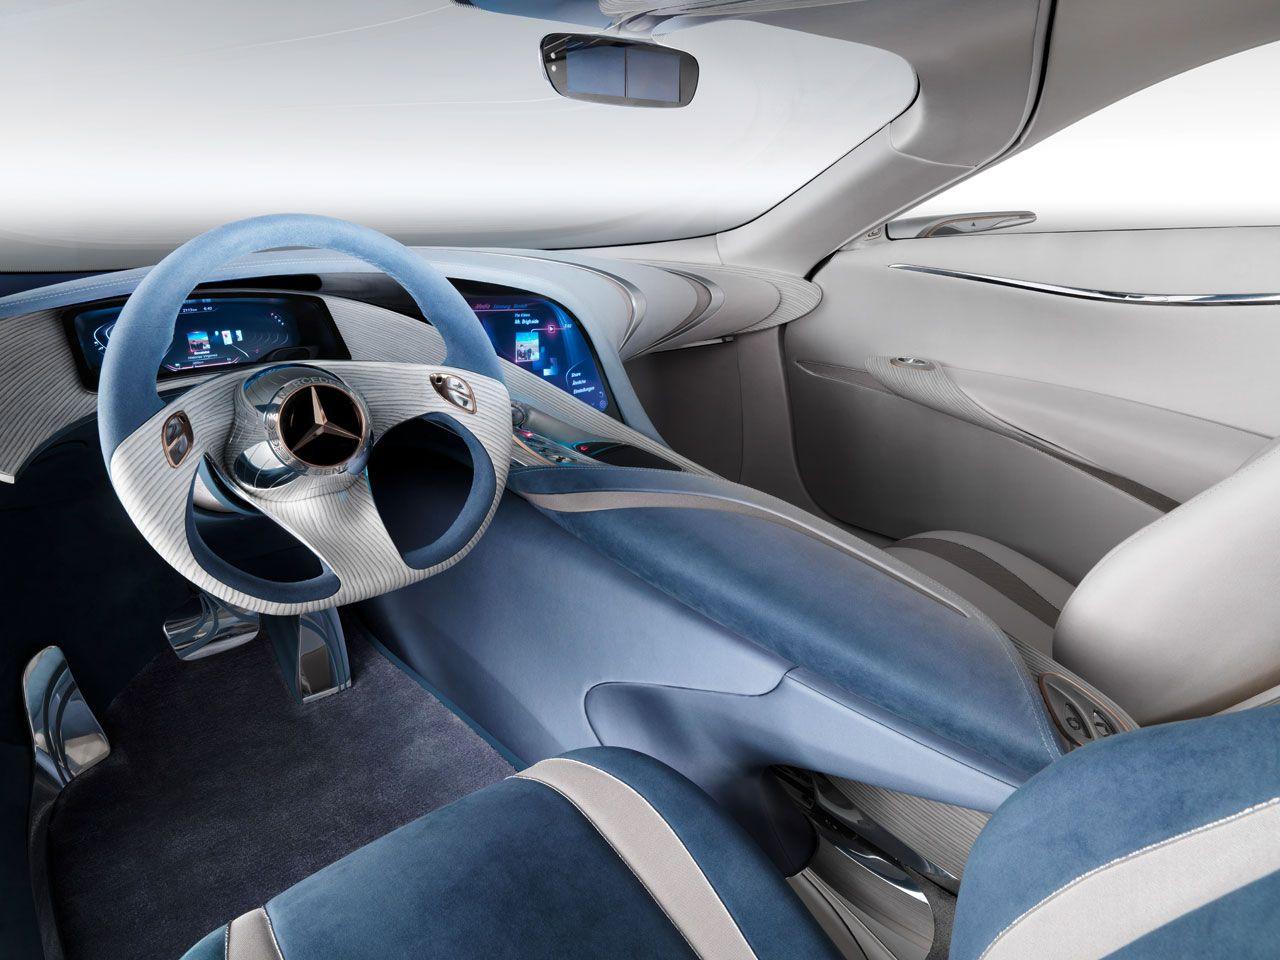 2025 Cars Mercedes Imagines The Suv Of 2025 Car Talk 1 Nairaland Diy Crafts That I